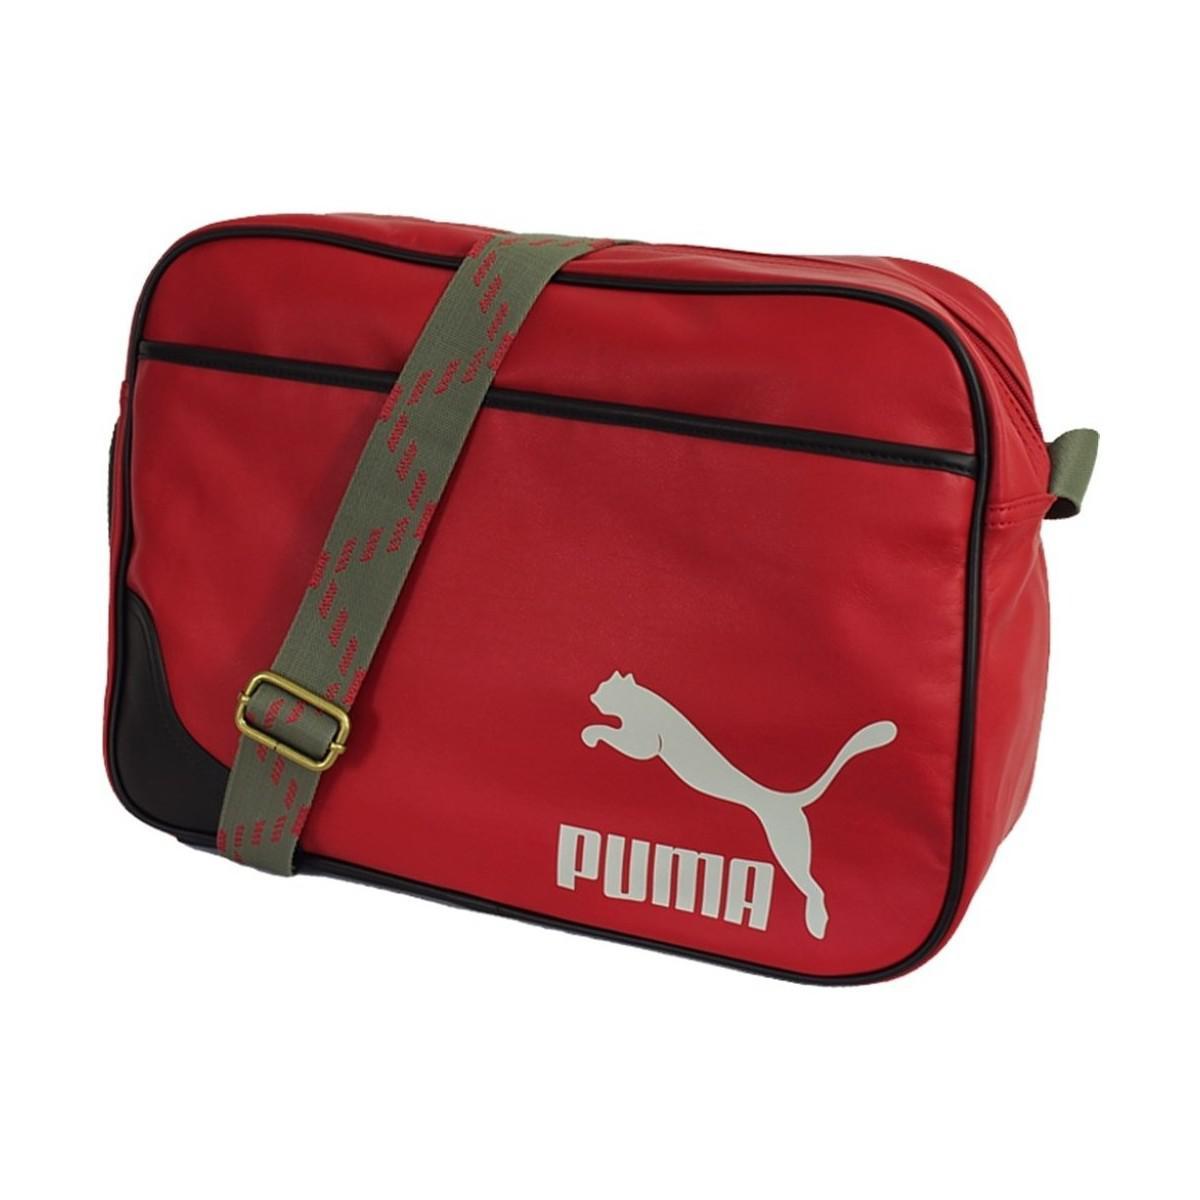 aa6fb4712e0e PUMA Originals Reporter Men s Messenger Bag In Red in Red for Men - Lyst